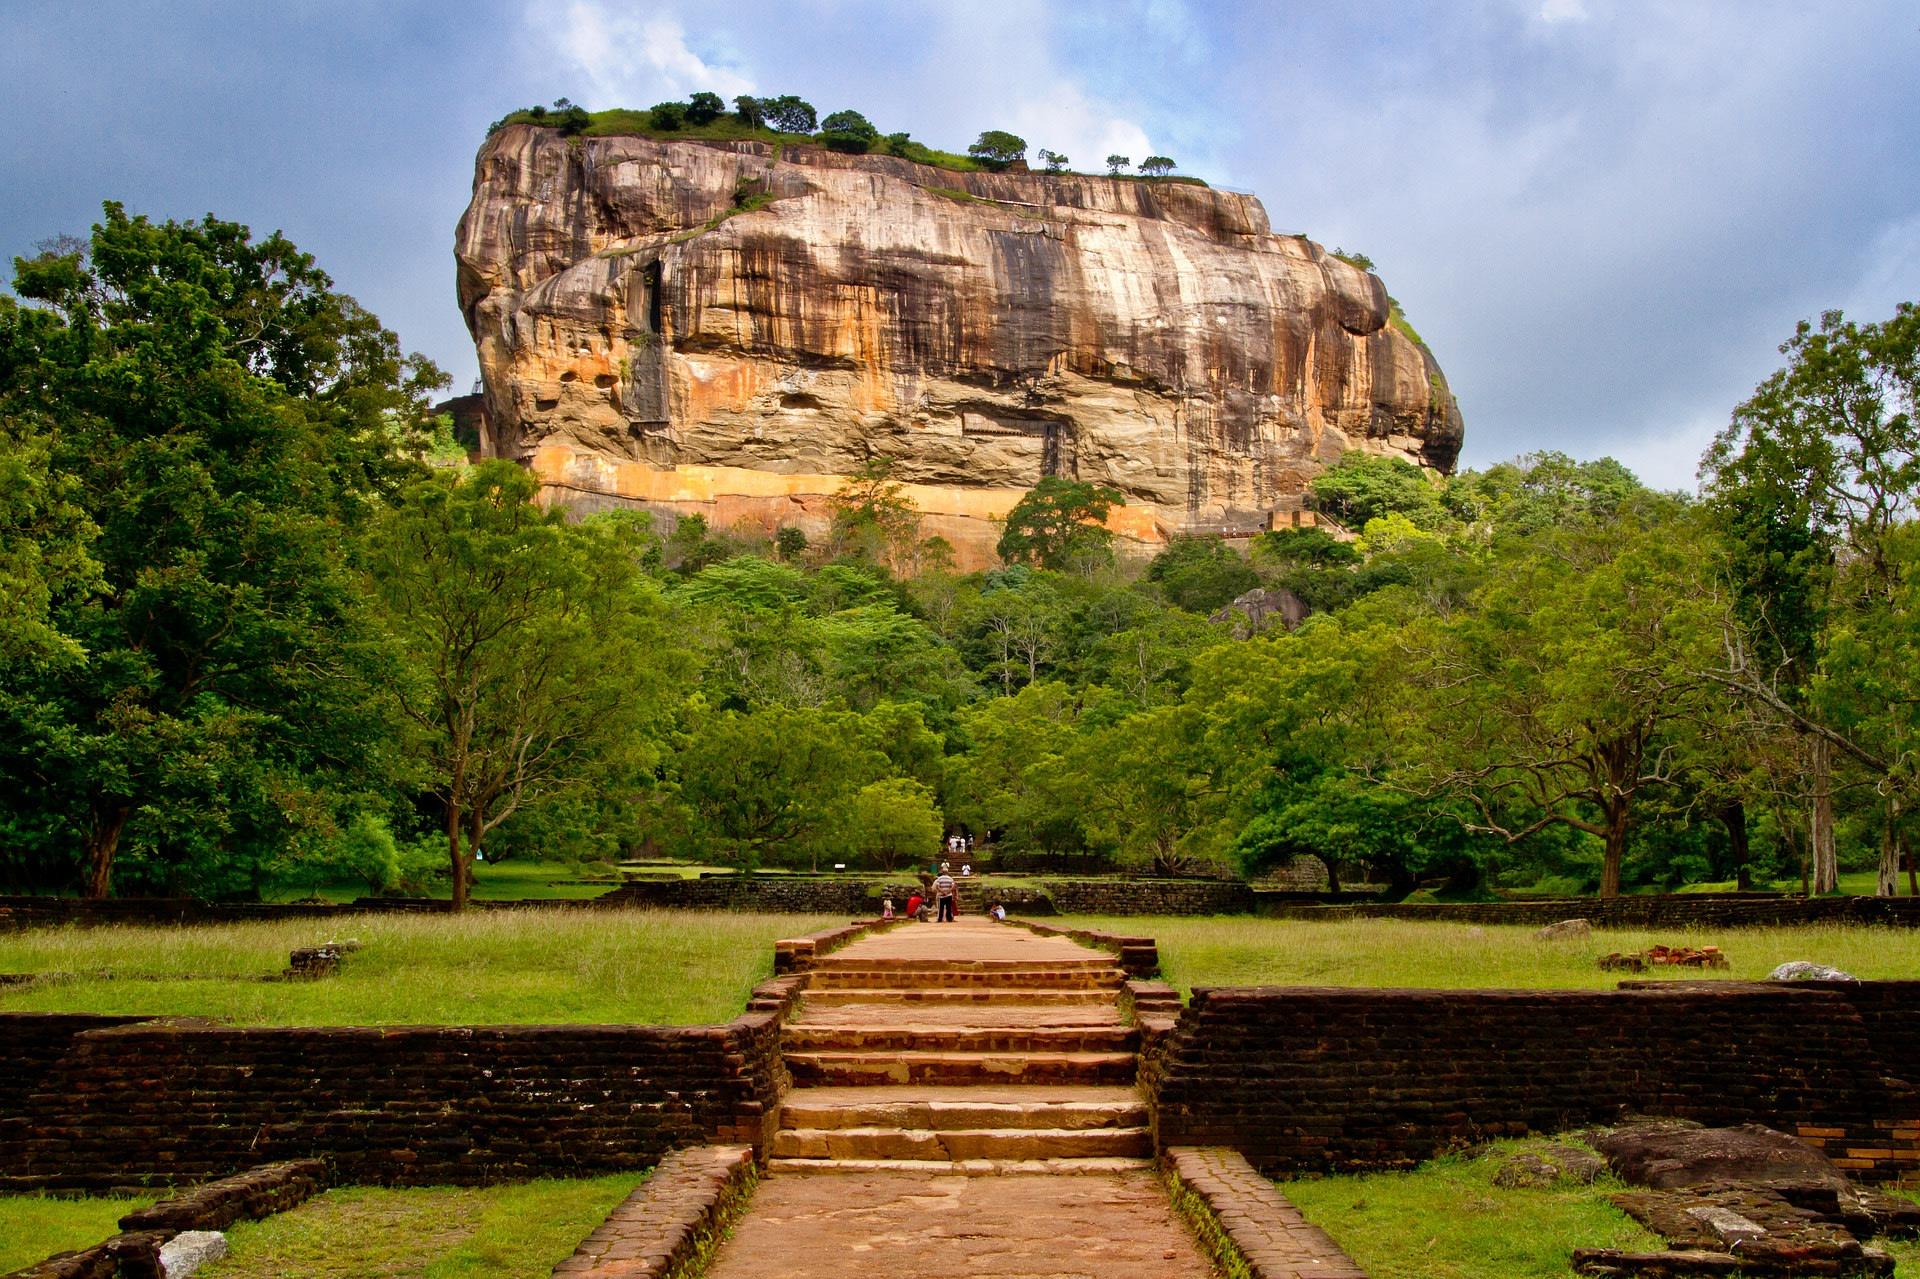 Make your way to the Sigiriya Rock